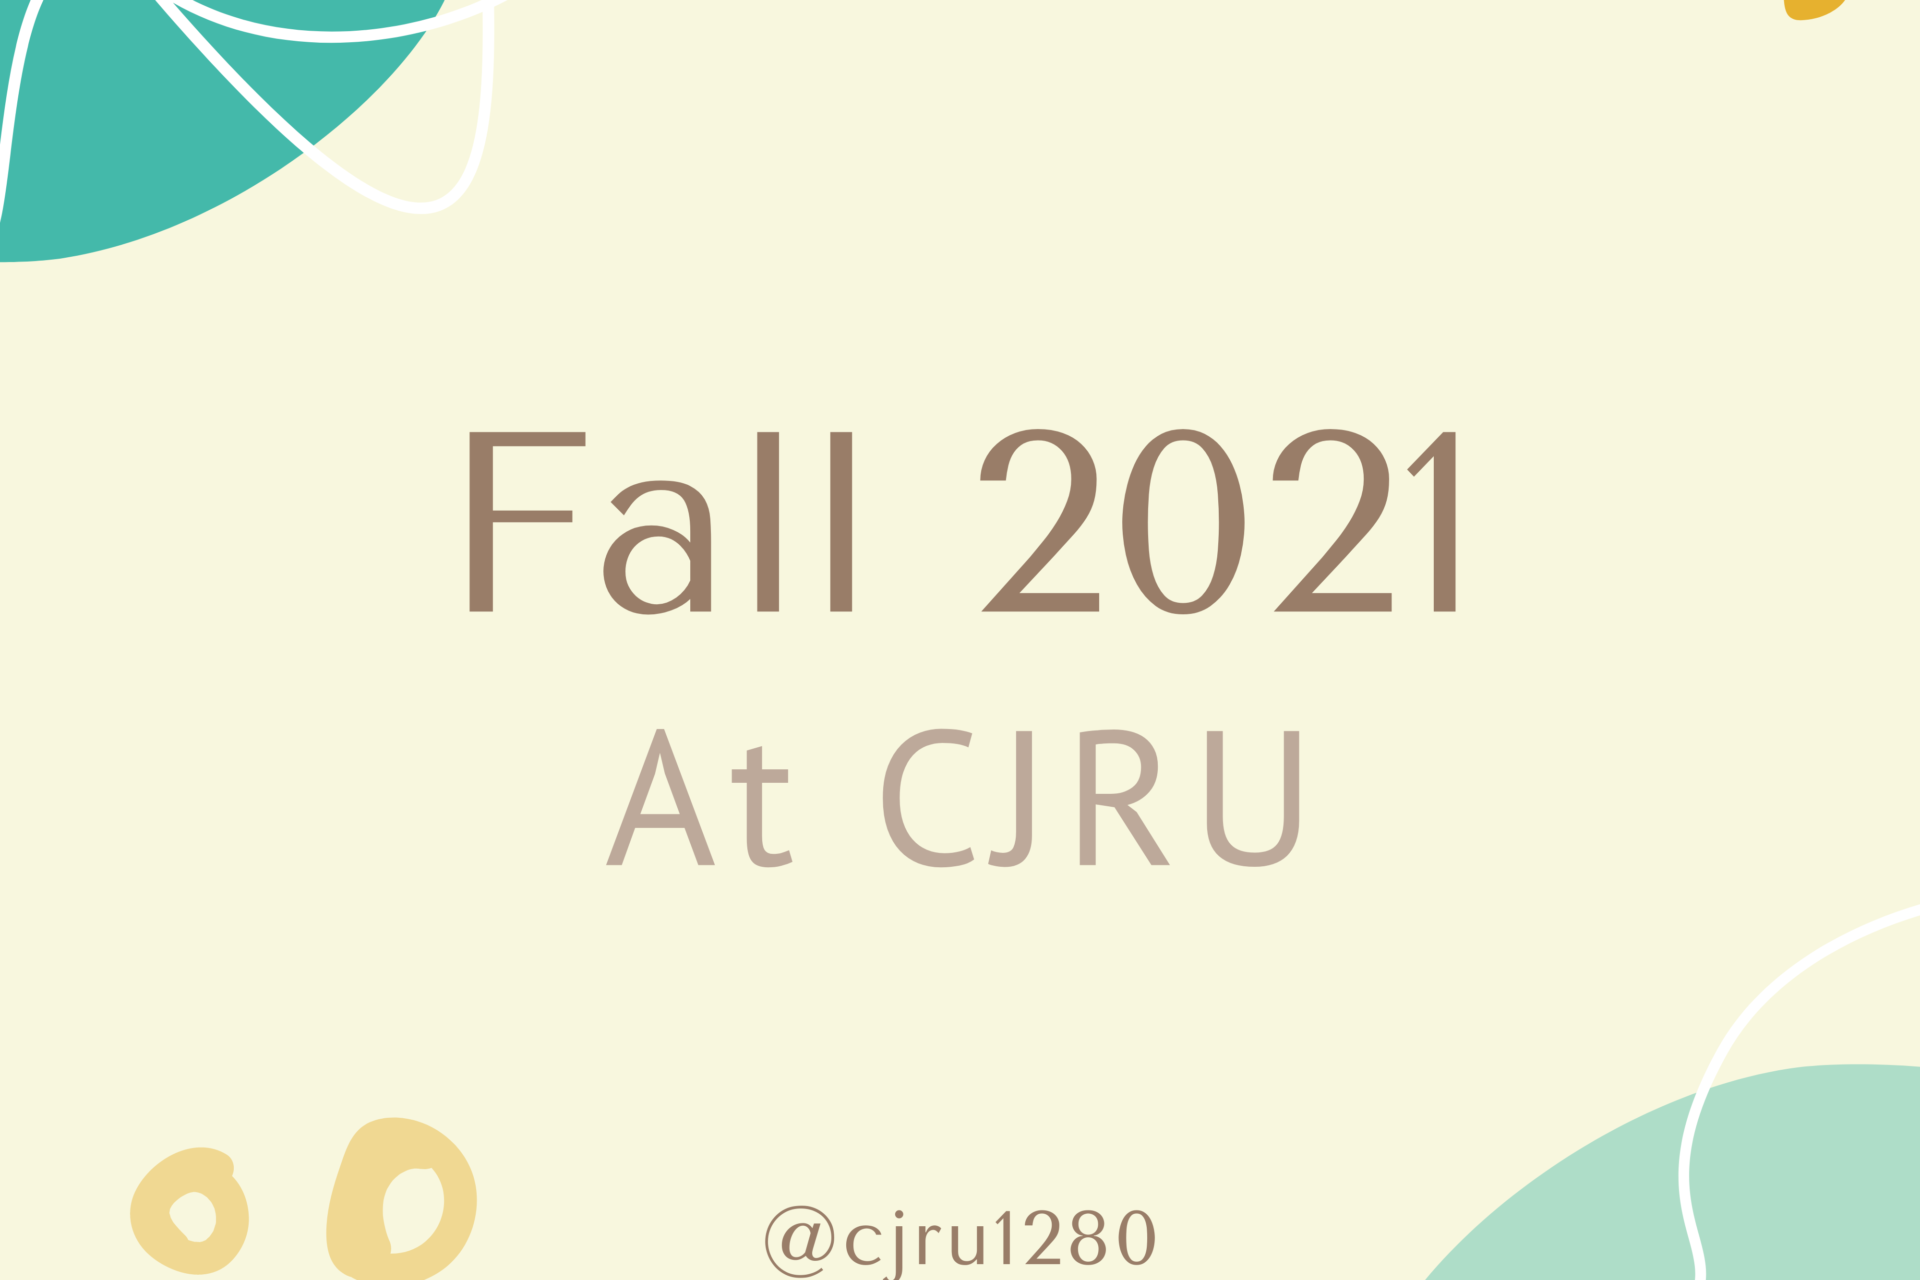 Fall 2021 at CJRU